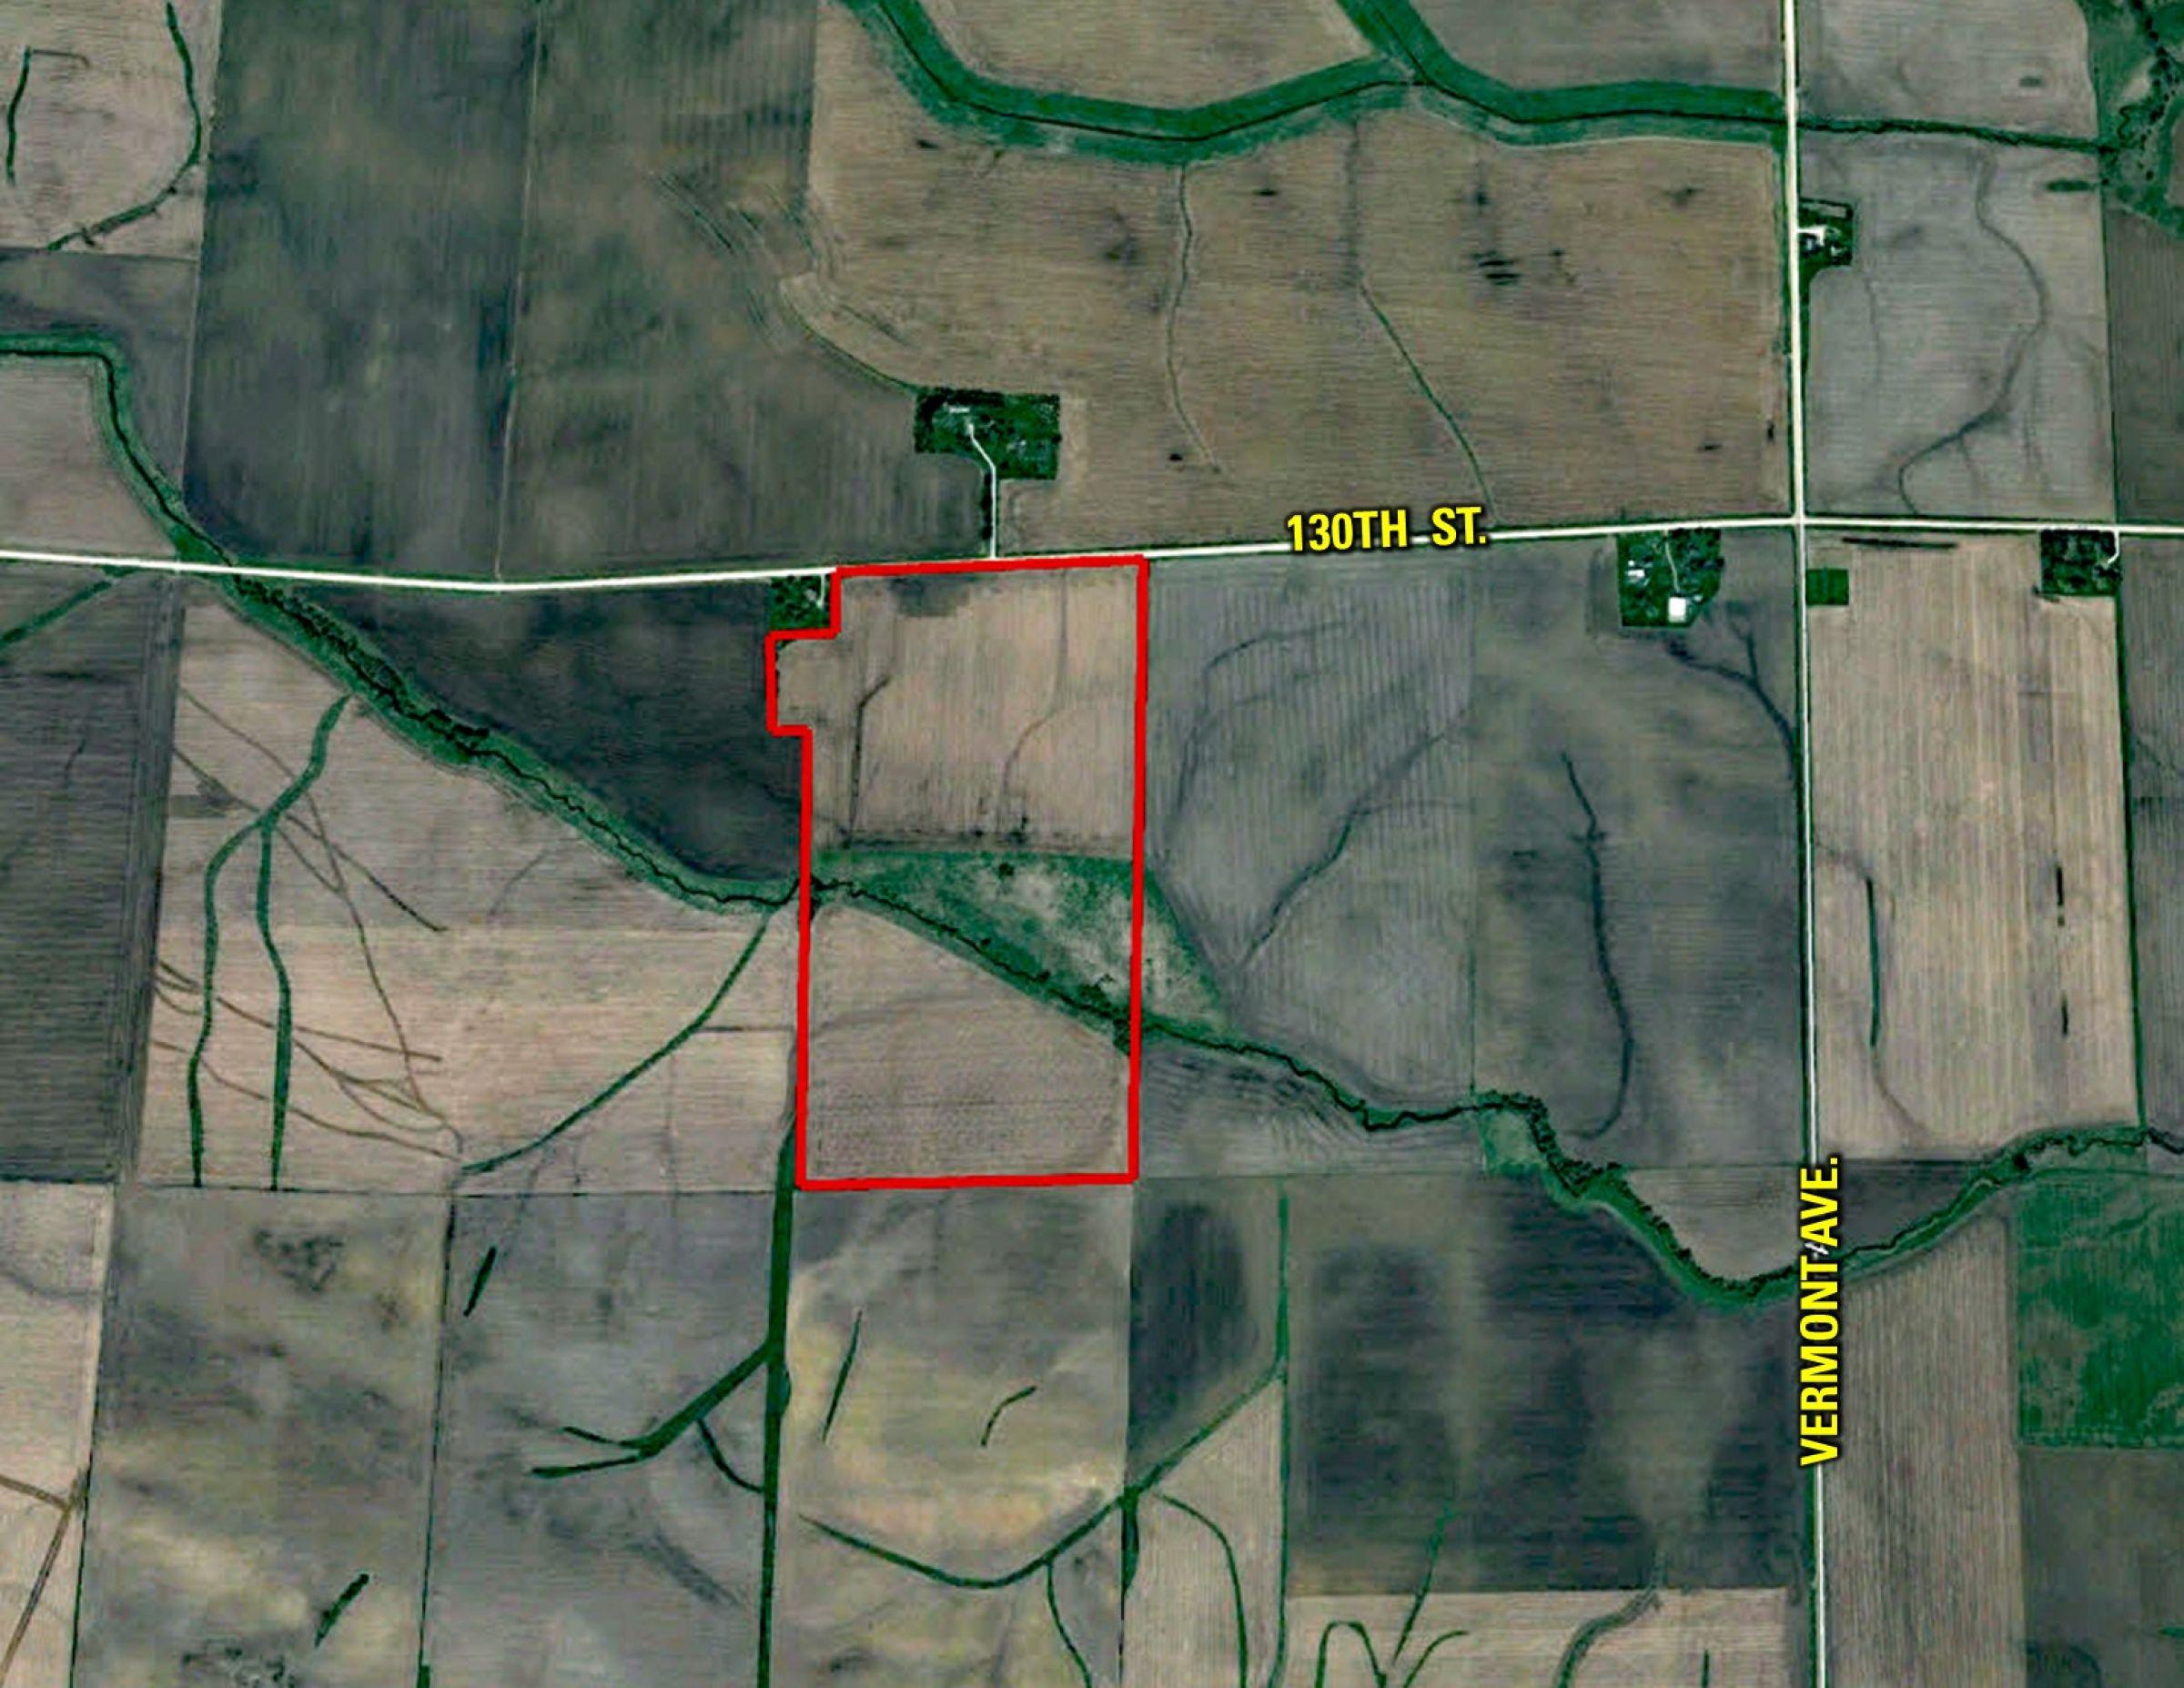 cedar-county-iowa-82-acres-listing-number-15084-0-2020-07-23-195848.jpg